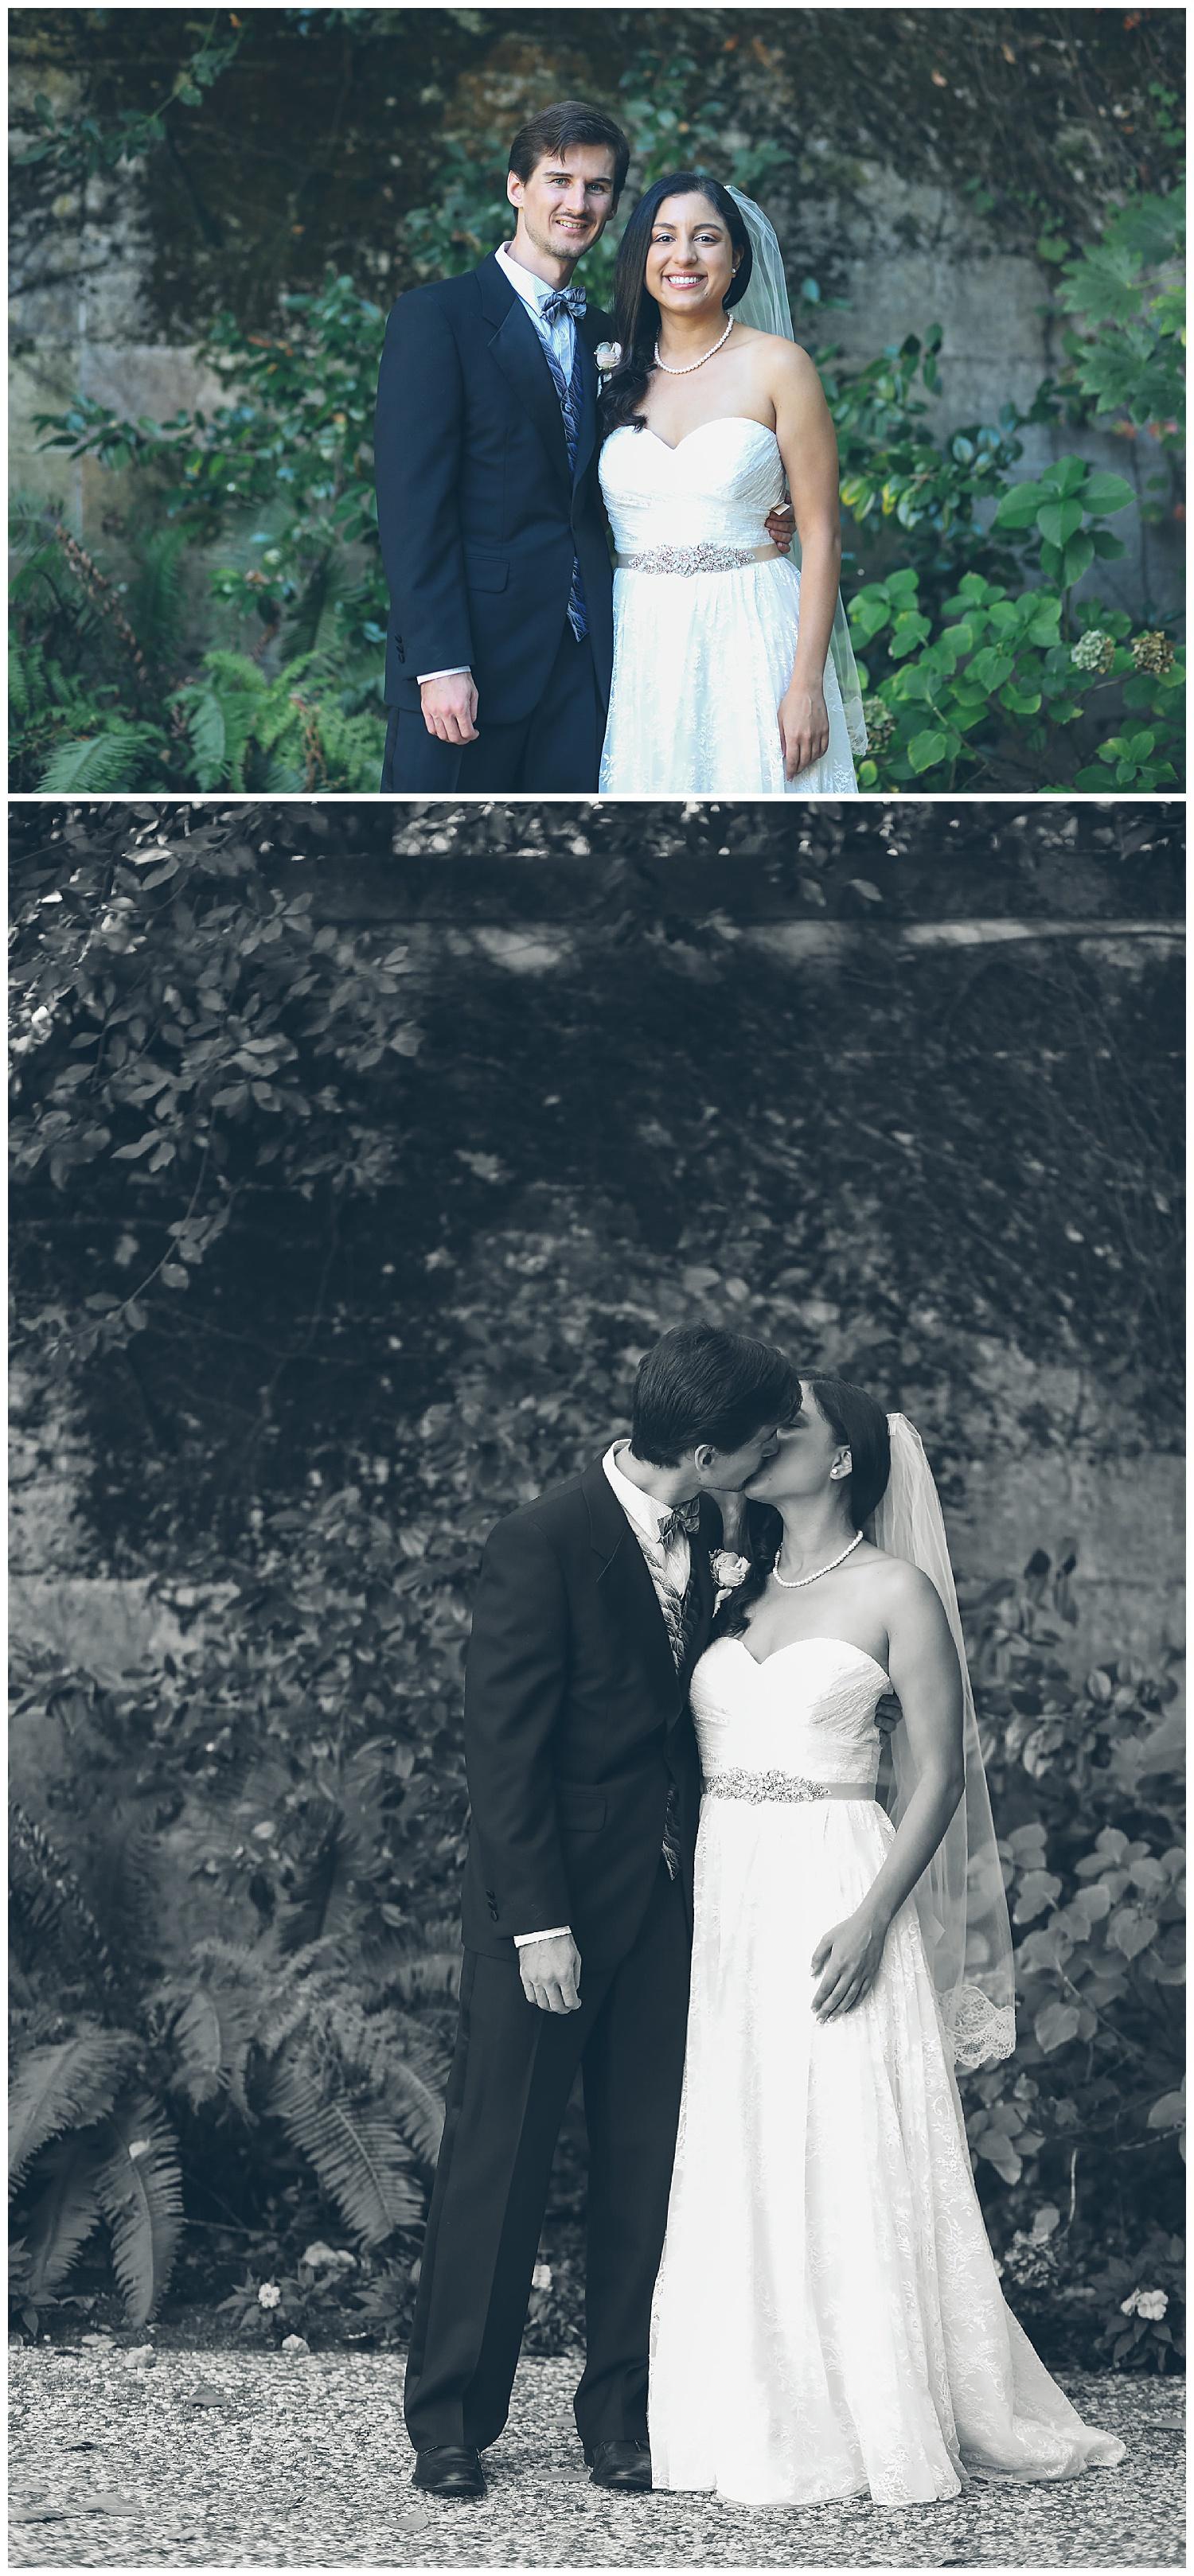 khariza-rae-photography-bay-area-wedding-photographer_0161.jpg